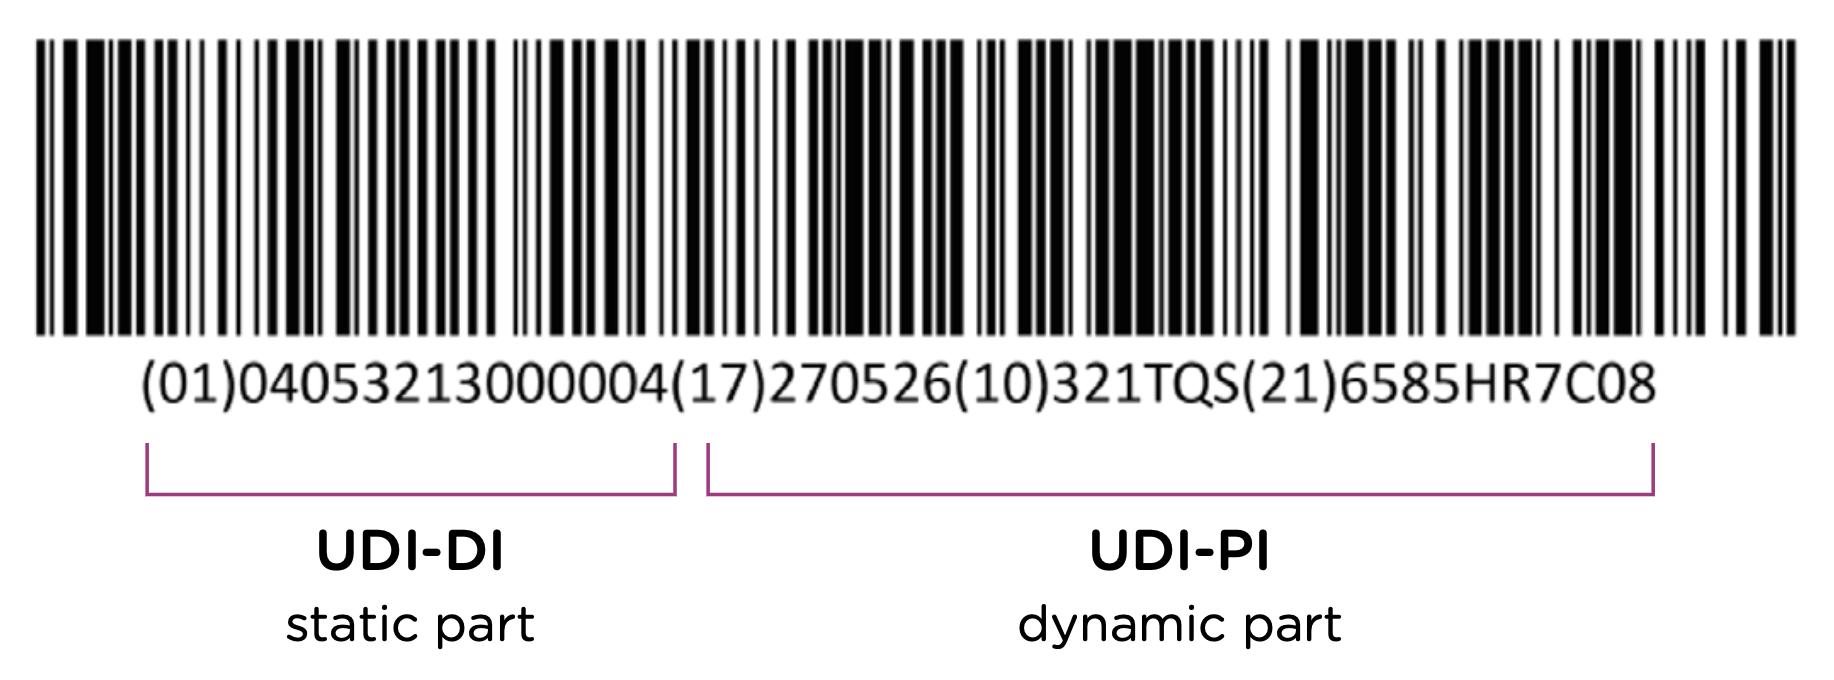 UDI Code Example